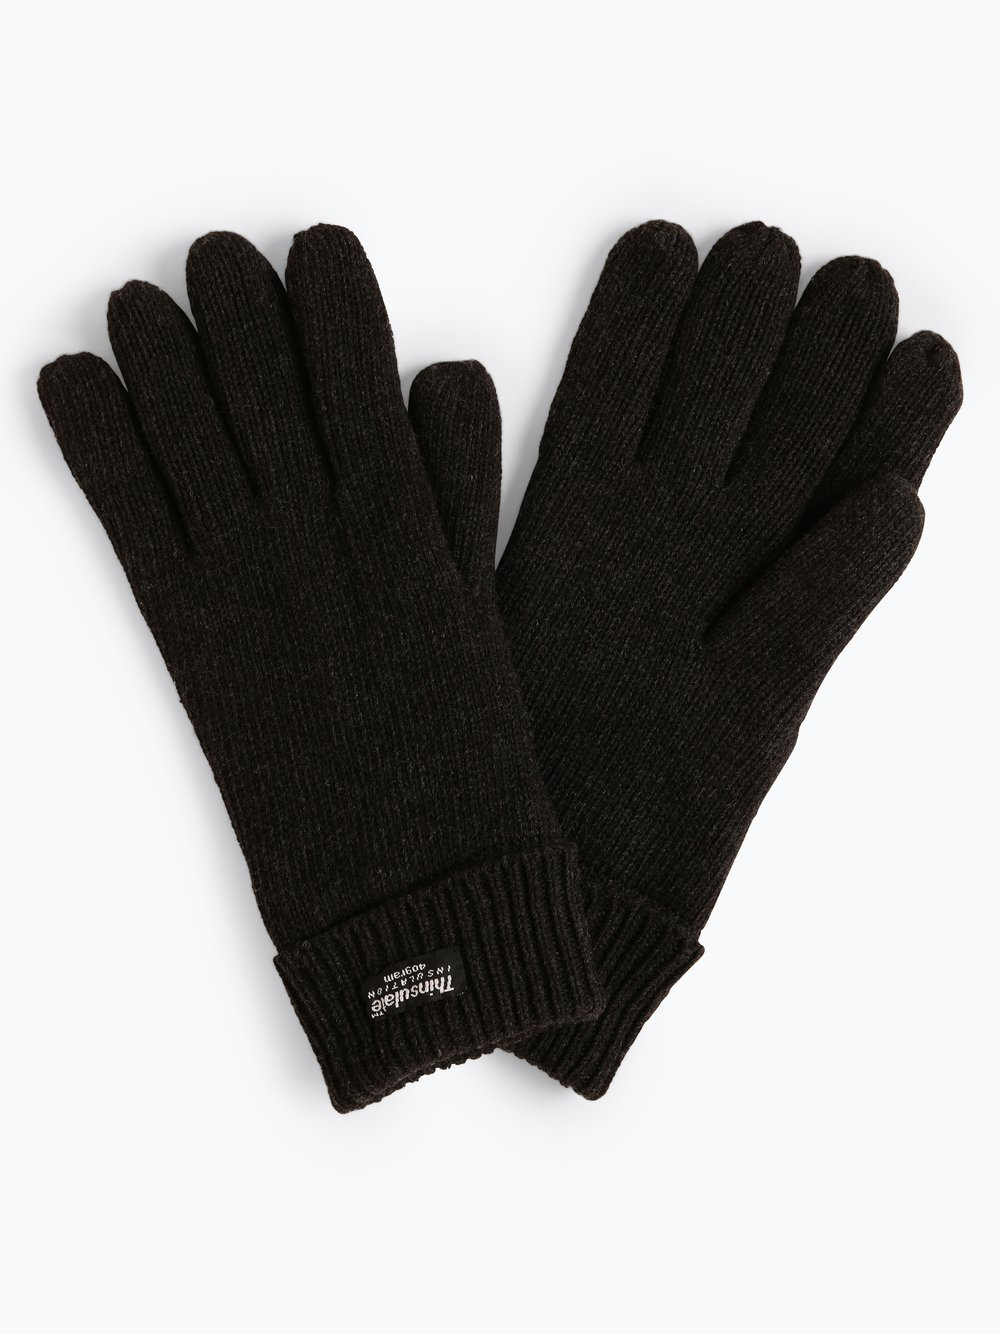 eem – Rękawiczki męskie, szary Van Graaf 413130-0002-09970